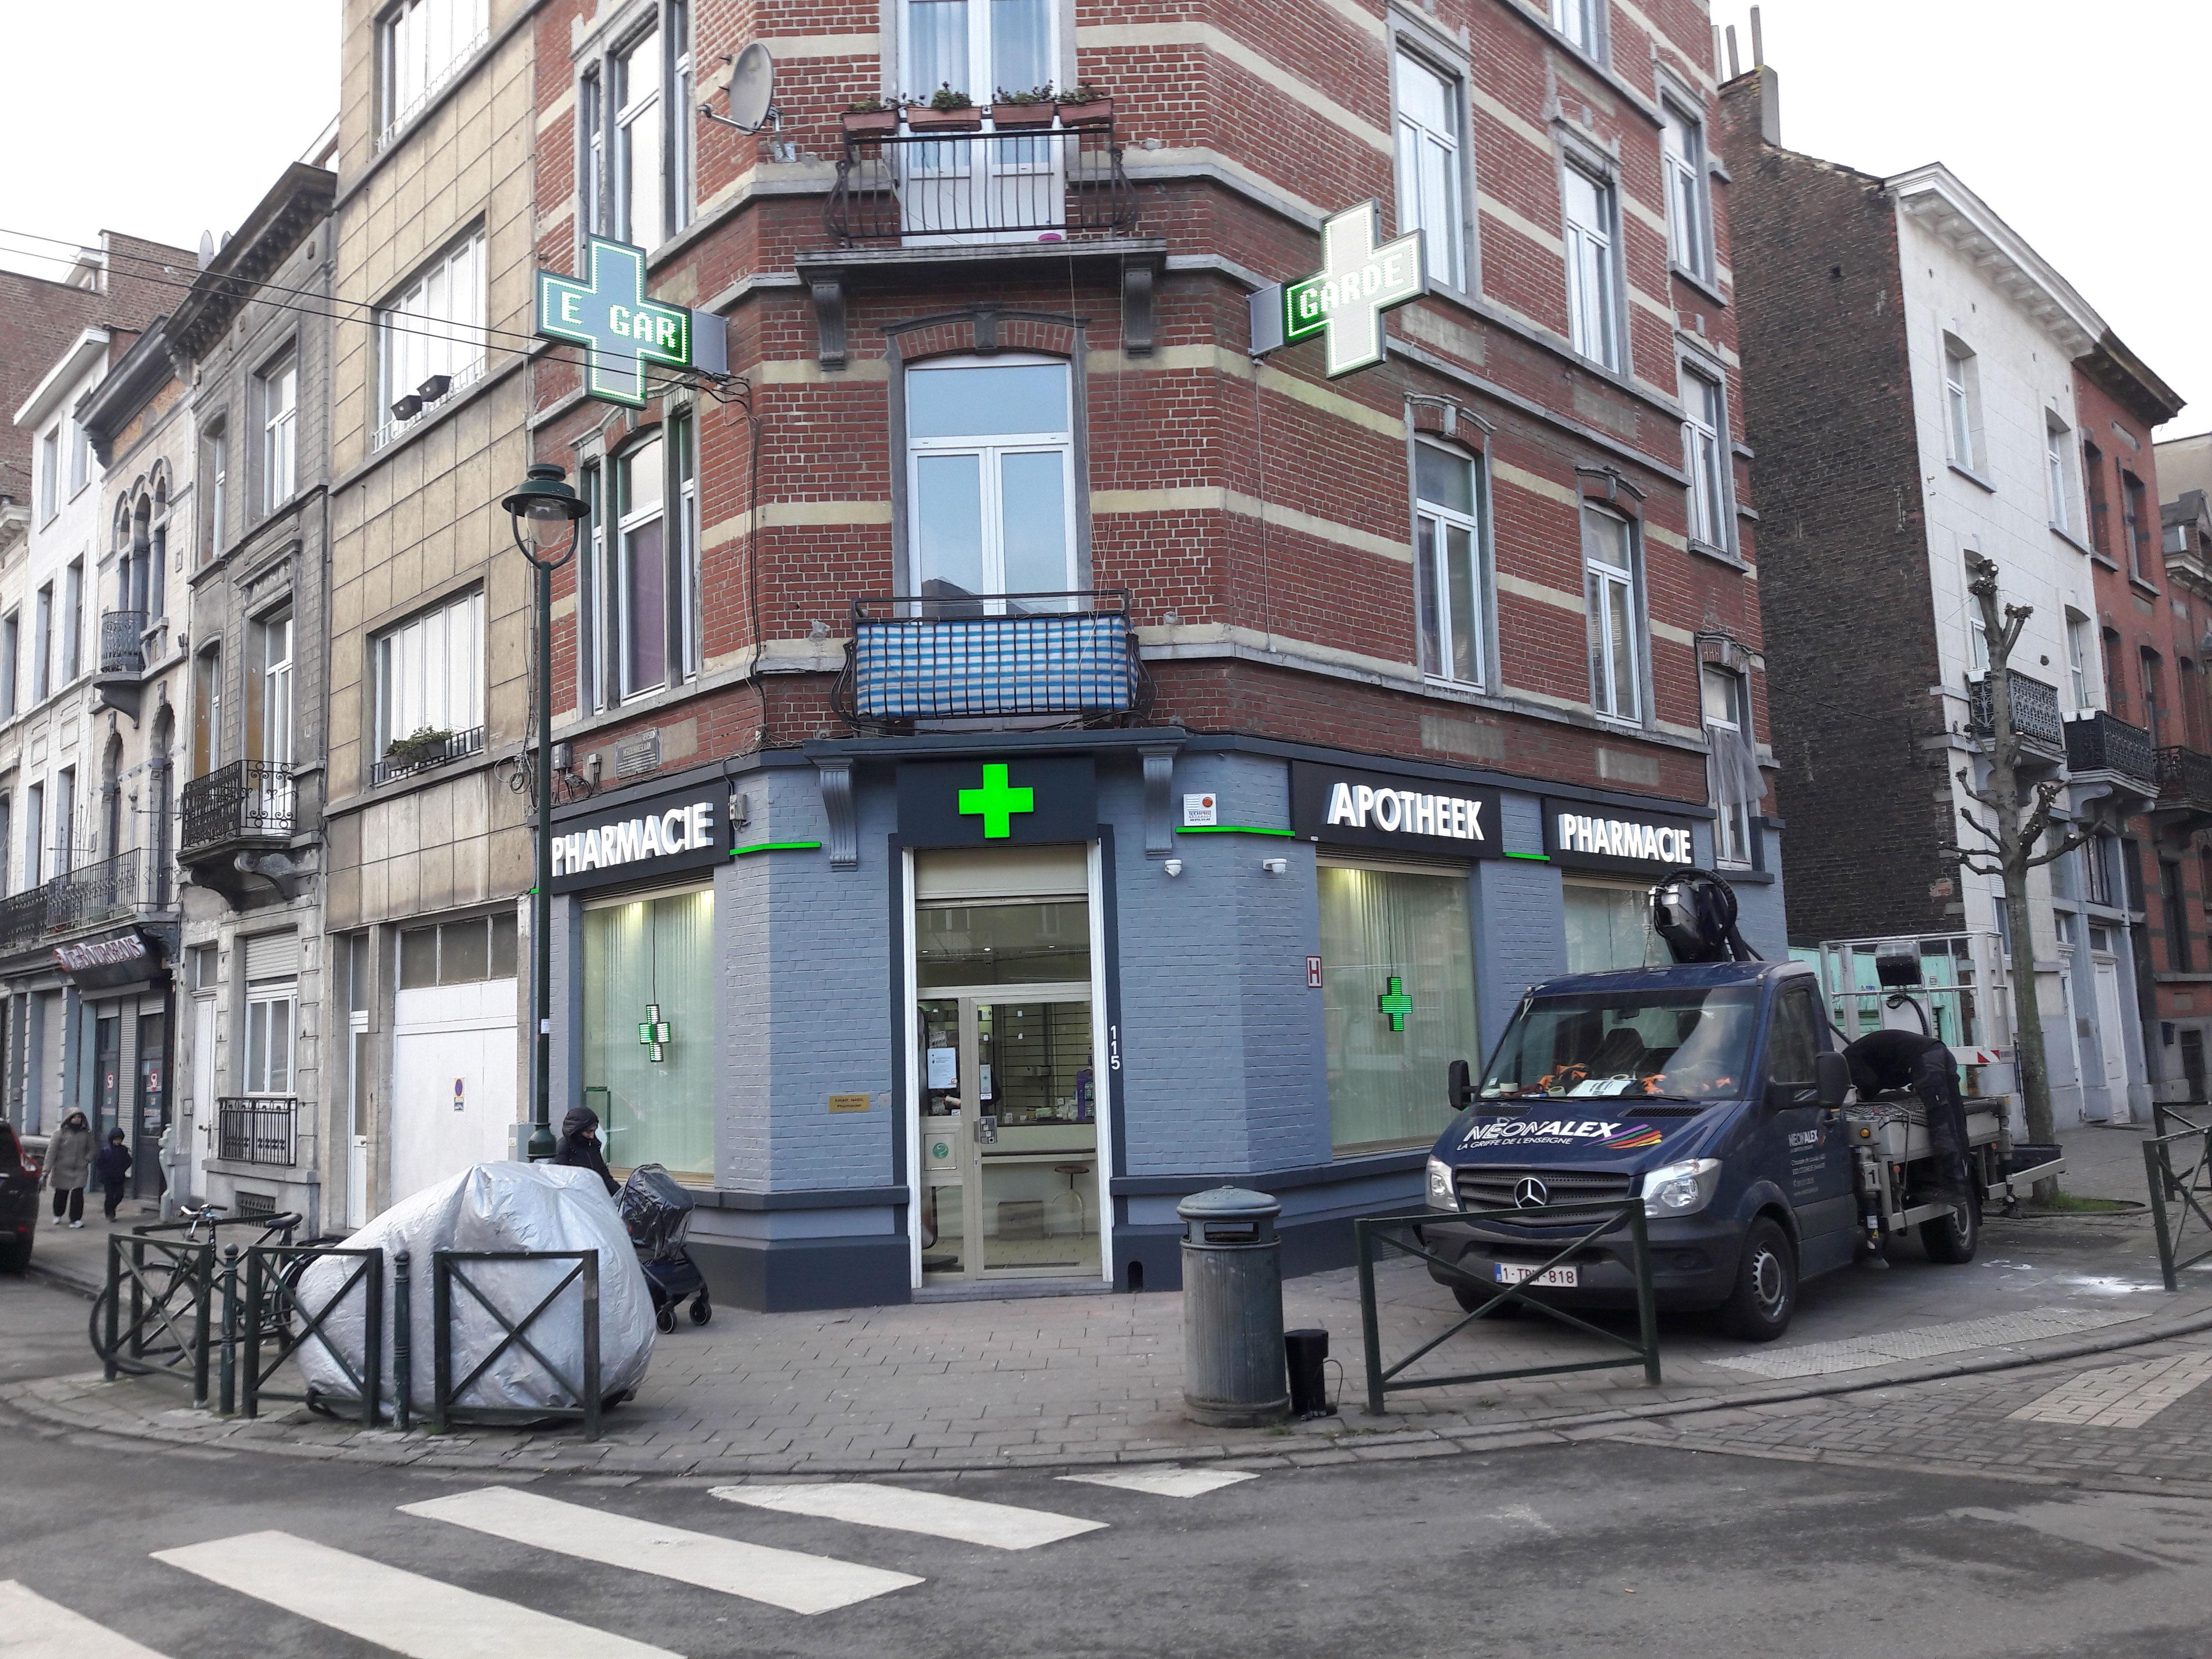 Enseigne et croix de pharmacie - Pharmacie Molenbeek